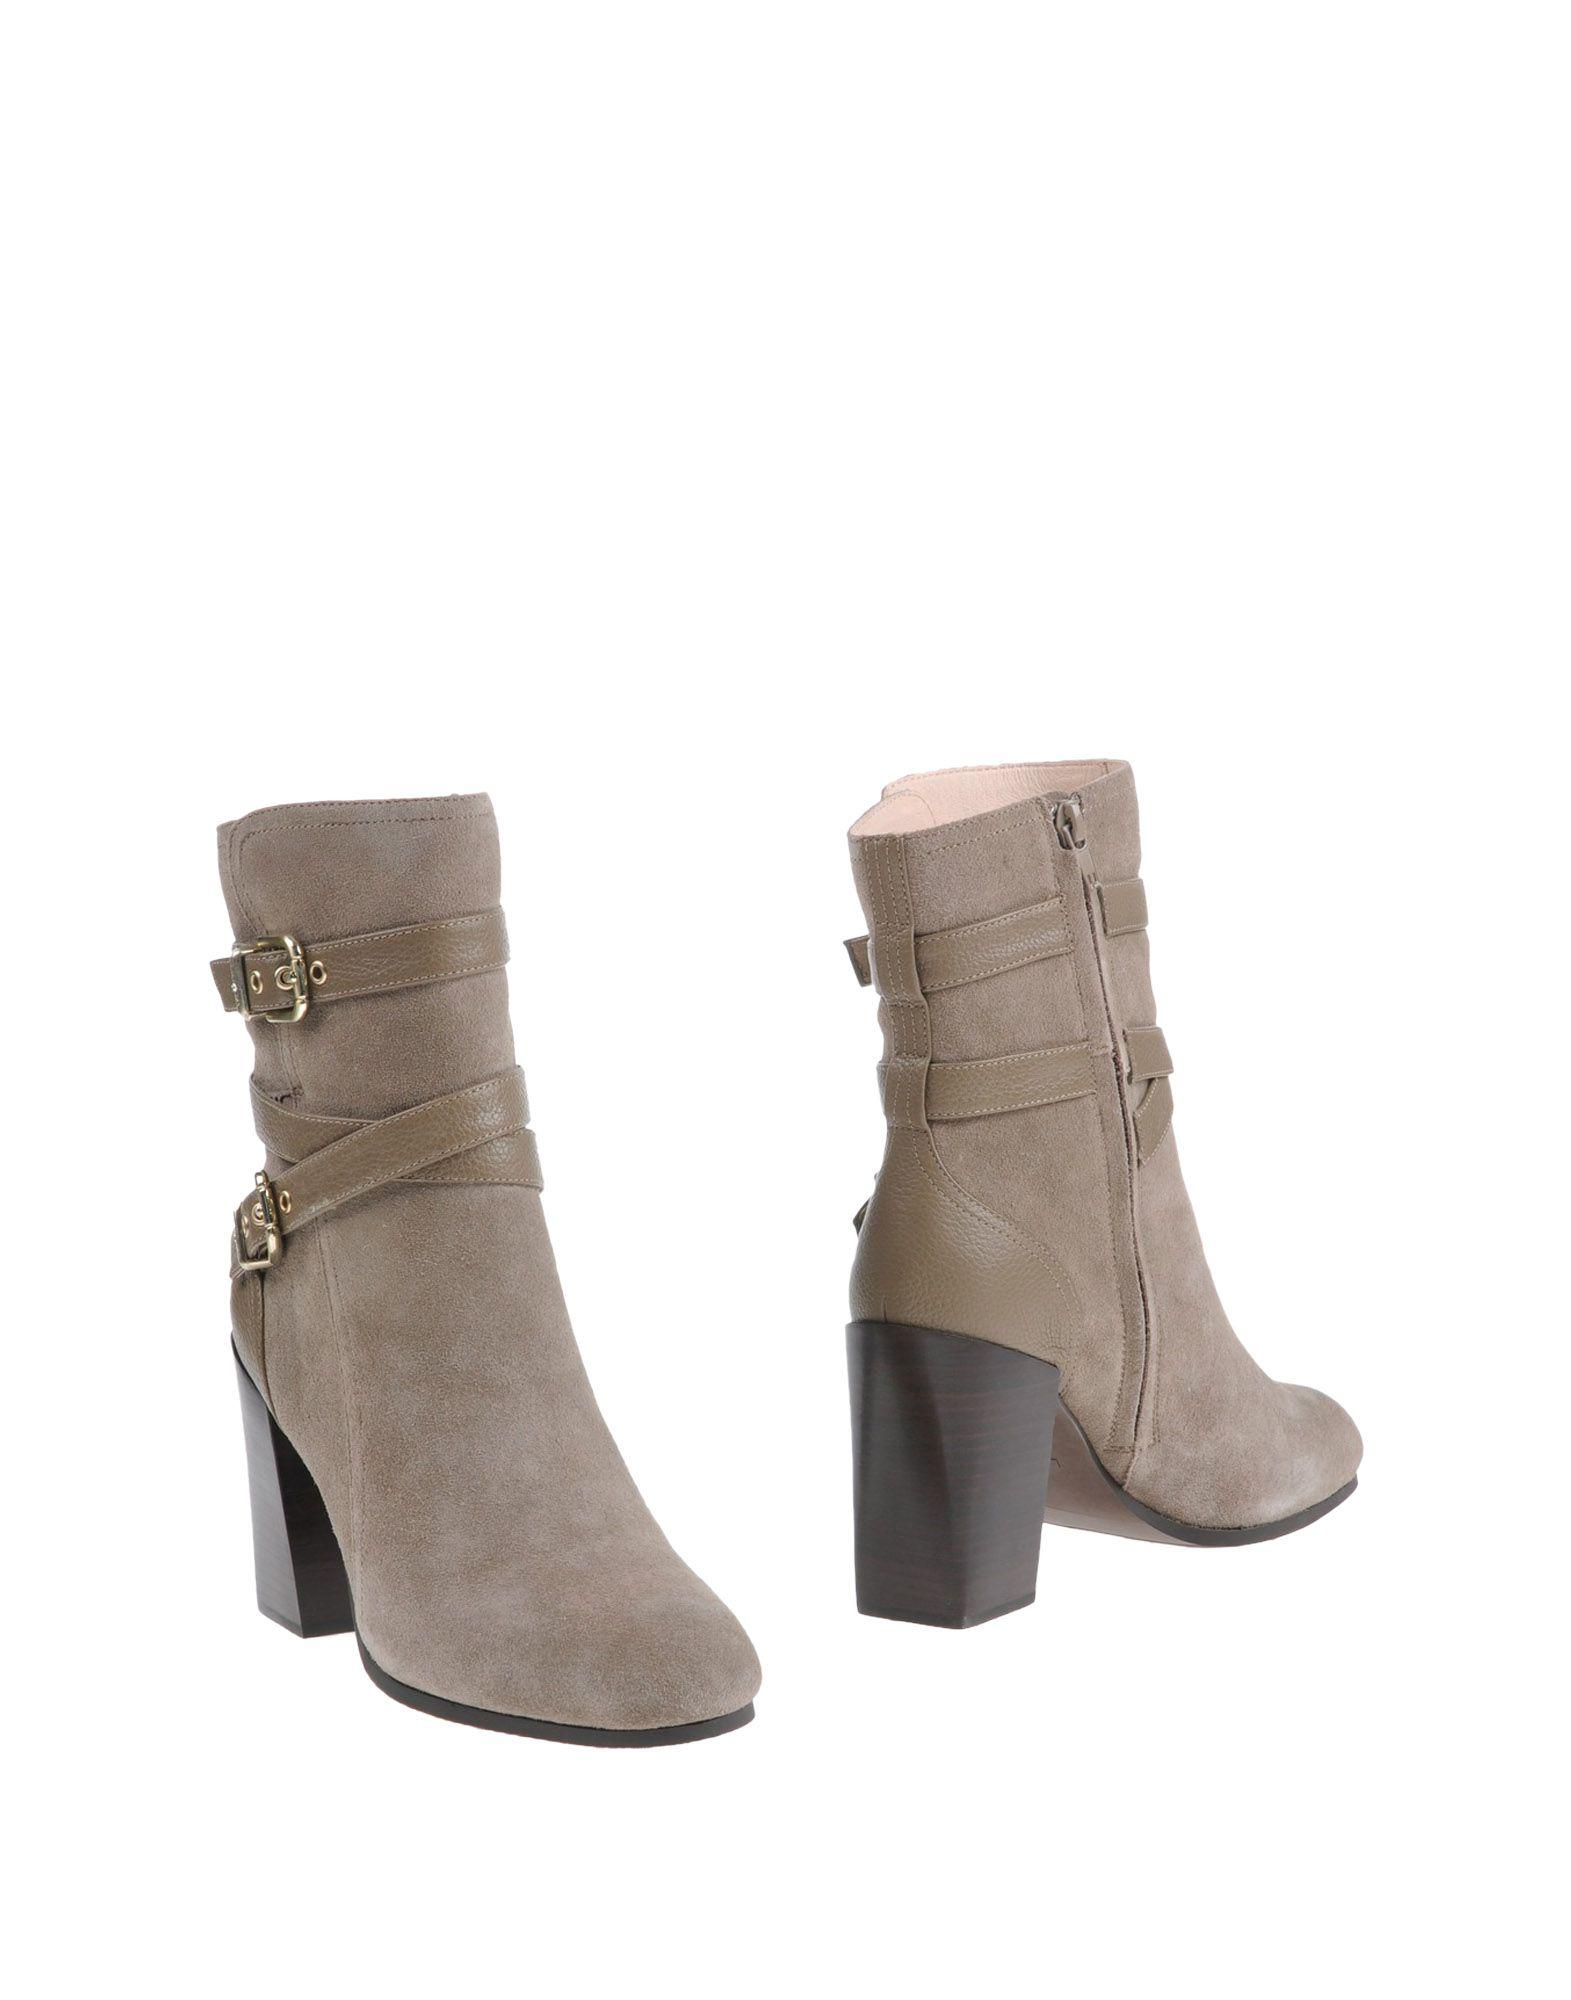 LIU •JO SHOES Полусапоги и высокие ботинки